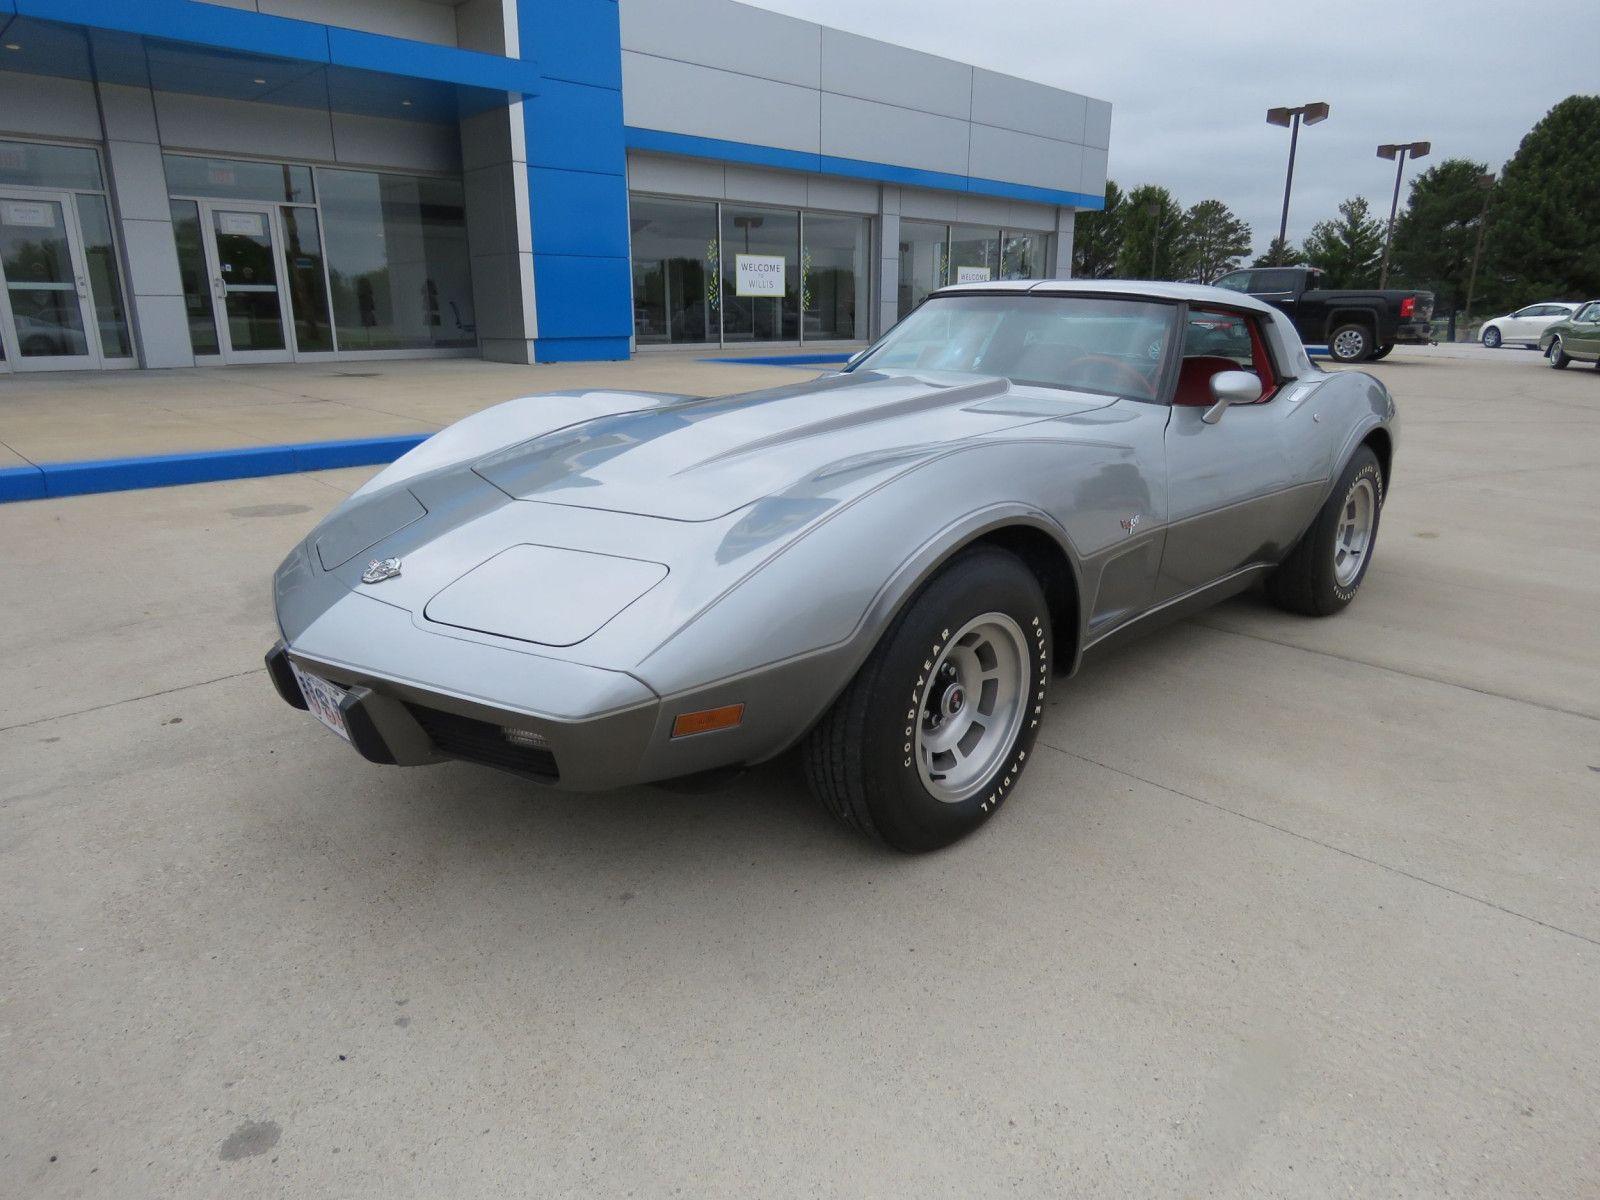 "<img src=""don-1978-corvette.jpg"" alt=""A 1978 Chevrolet Corvette Coupe 25th Anniversary time capsule"">"